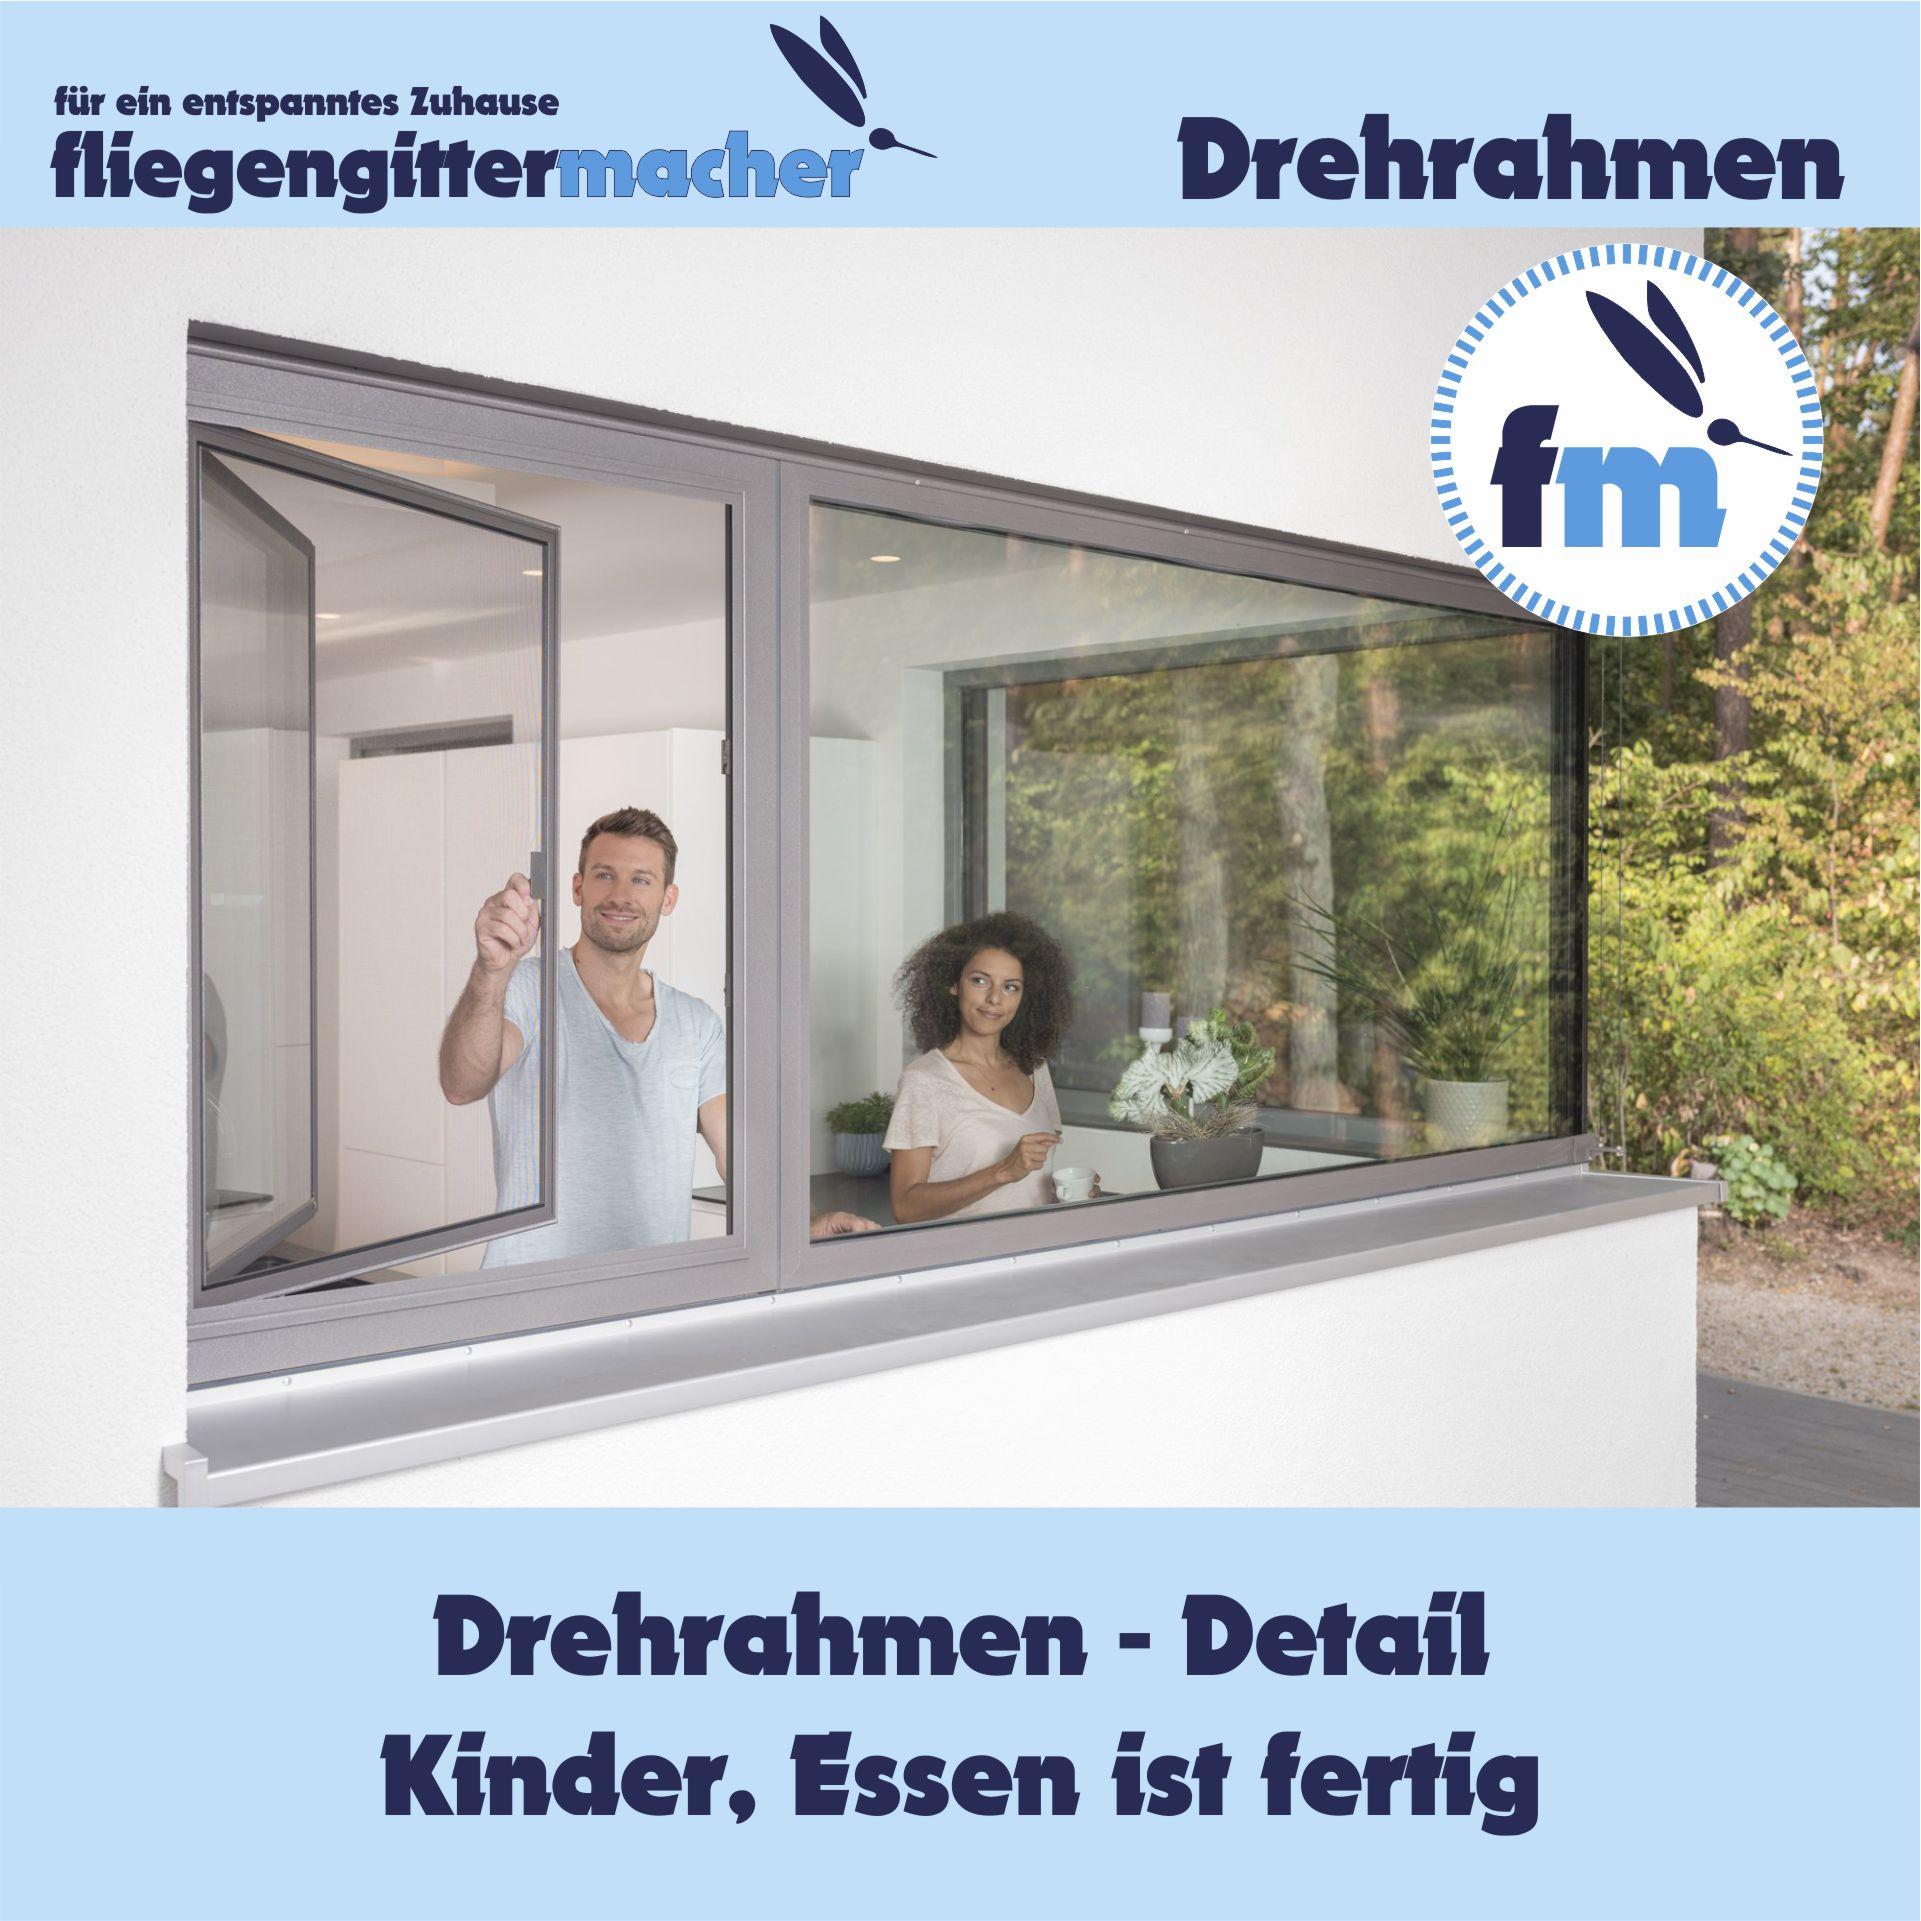 Insektenschutz Drehrahmen   www.fliegengittermacher.de   Fliegengitter nach Maß